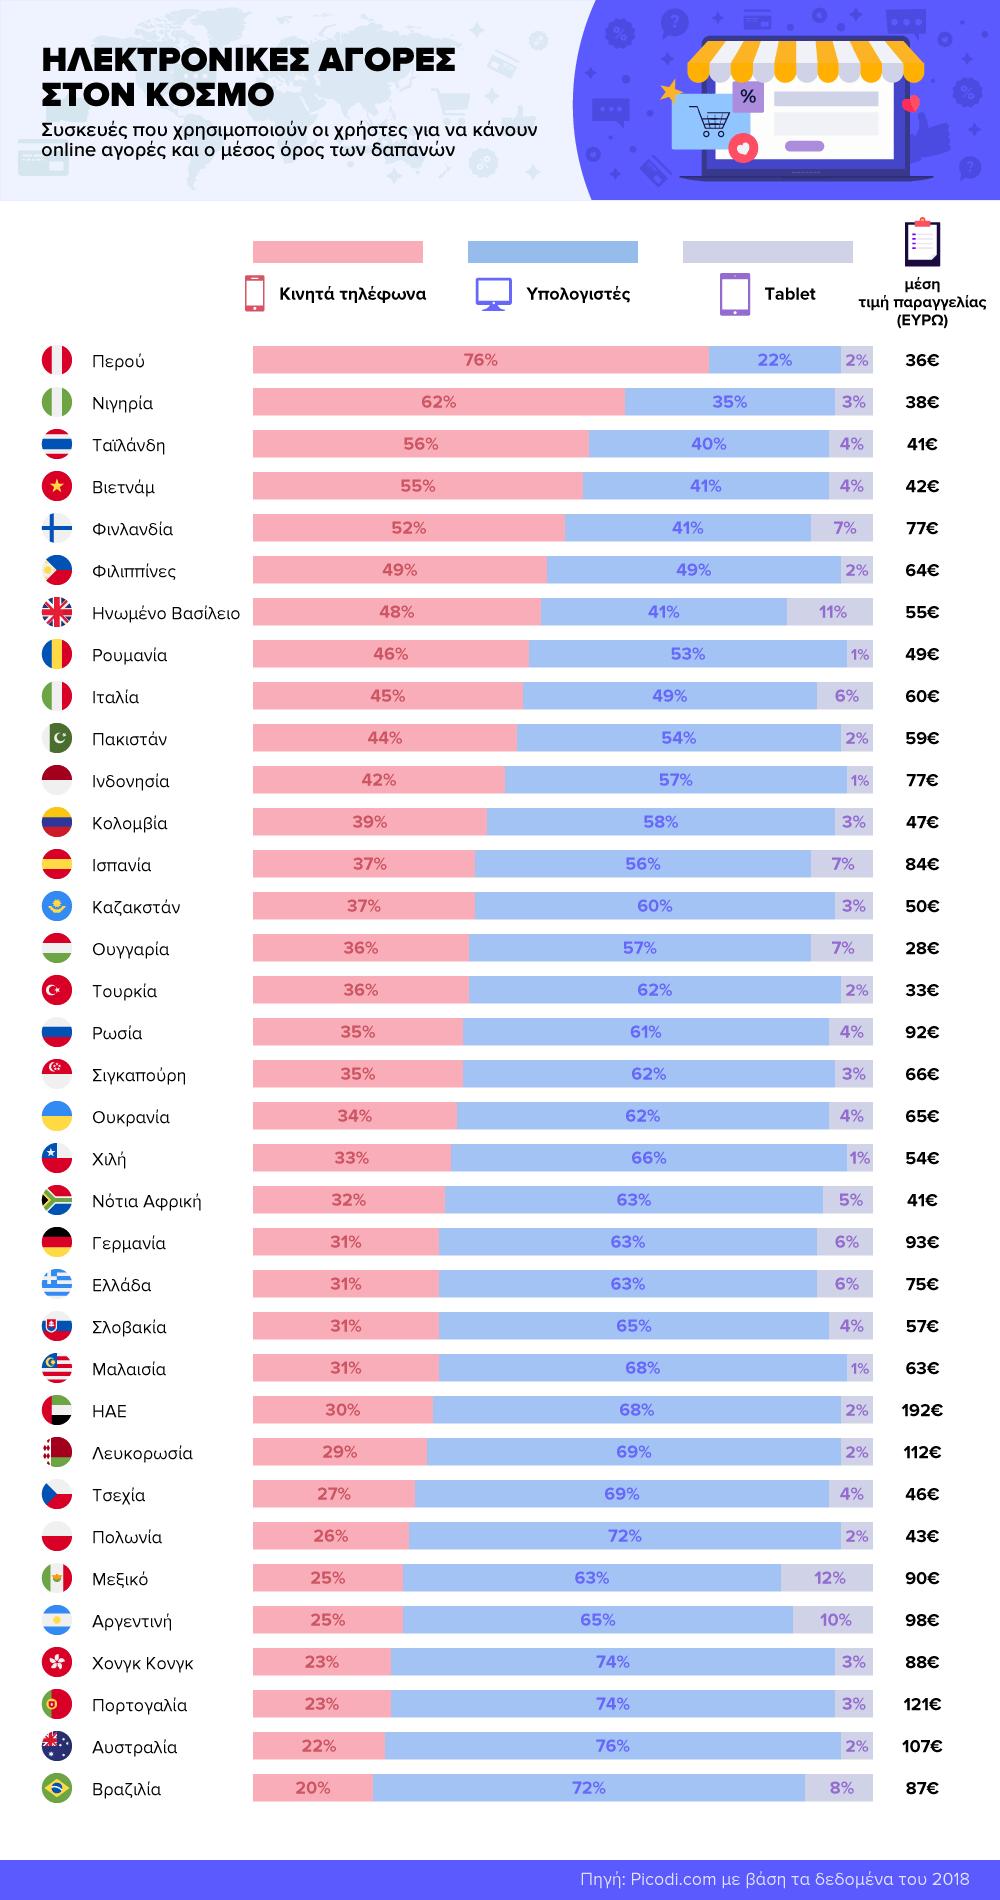 Online αγοραστές σε όλο τον κόσμο